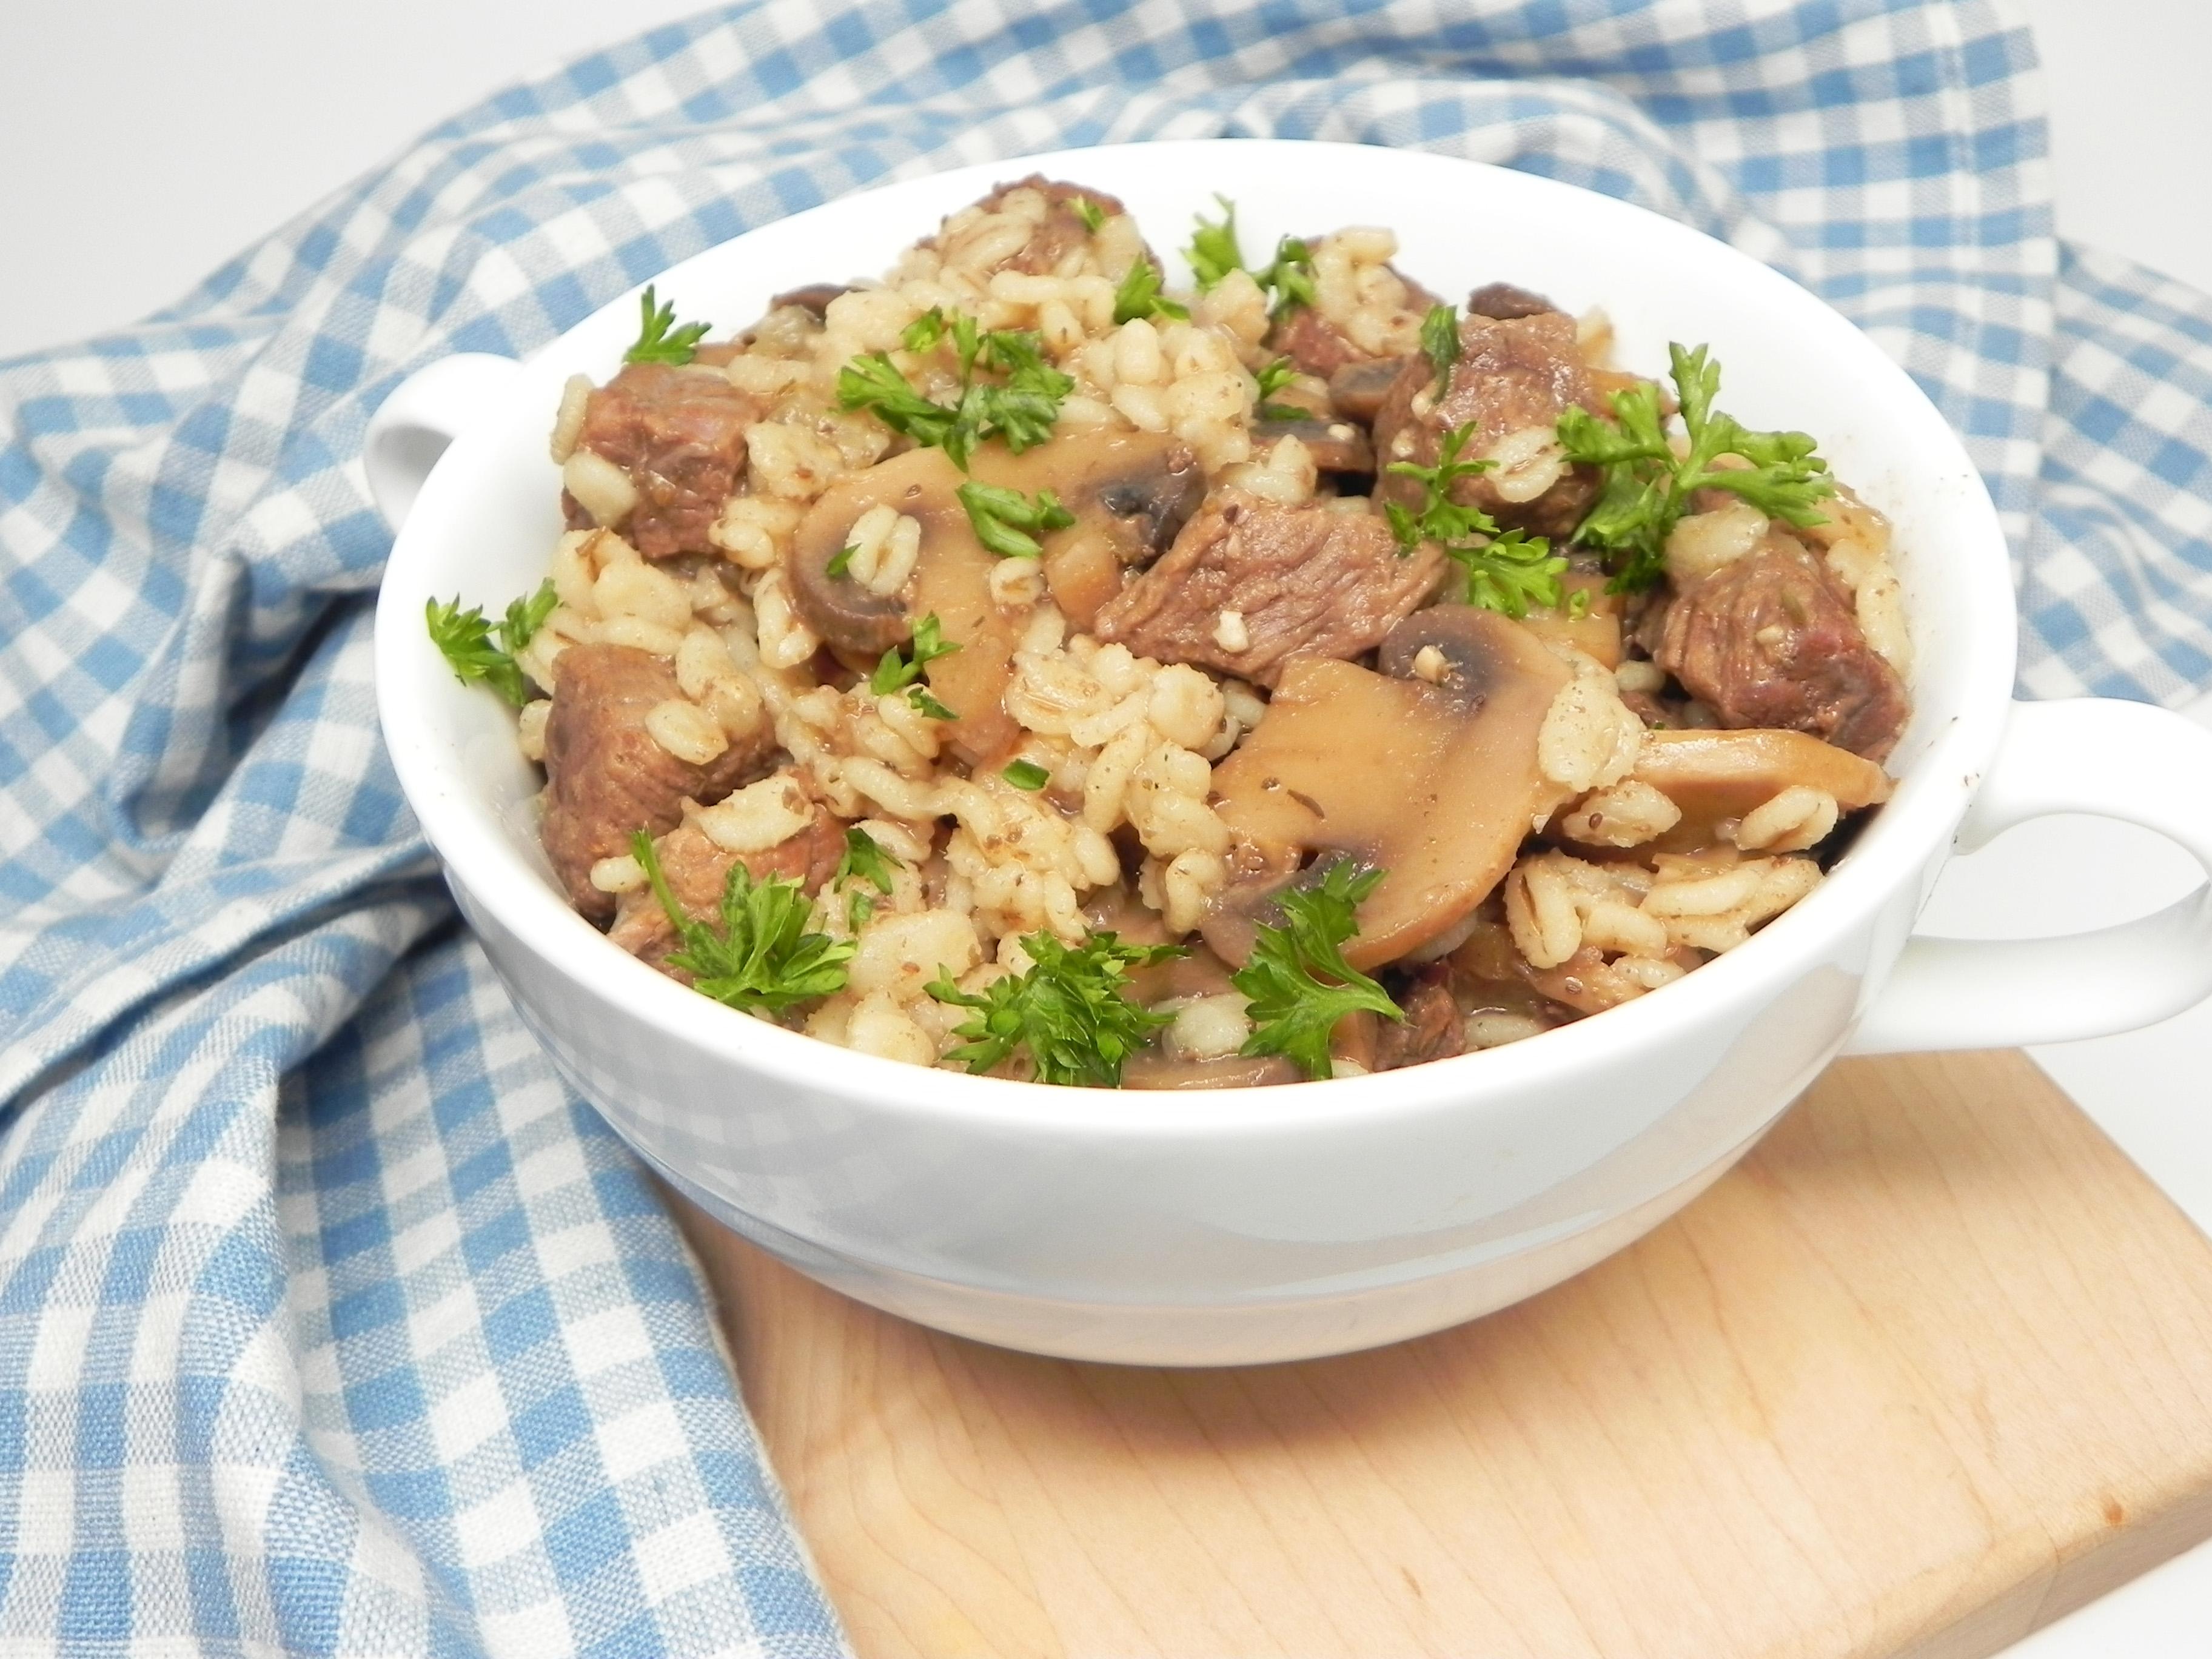 Instant Pot® Beef, Mushroom, and Barley Bowl